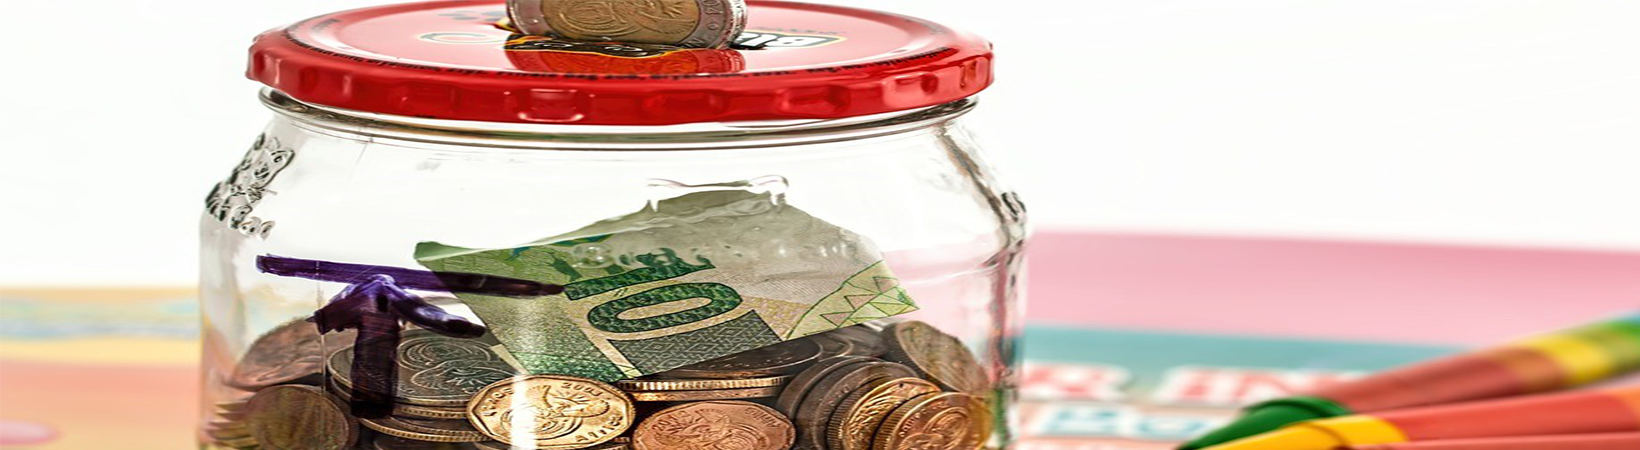 Pet načina kako da zaradiš dodatni džeparac